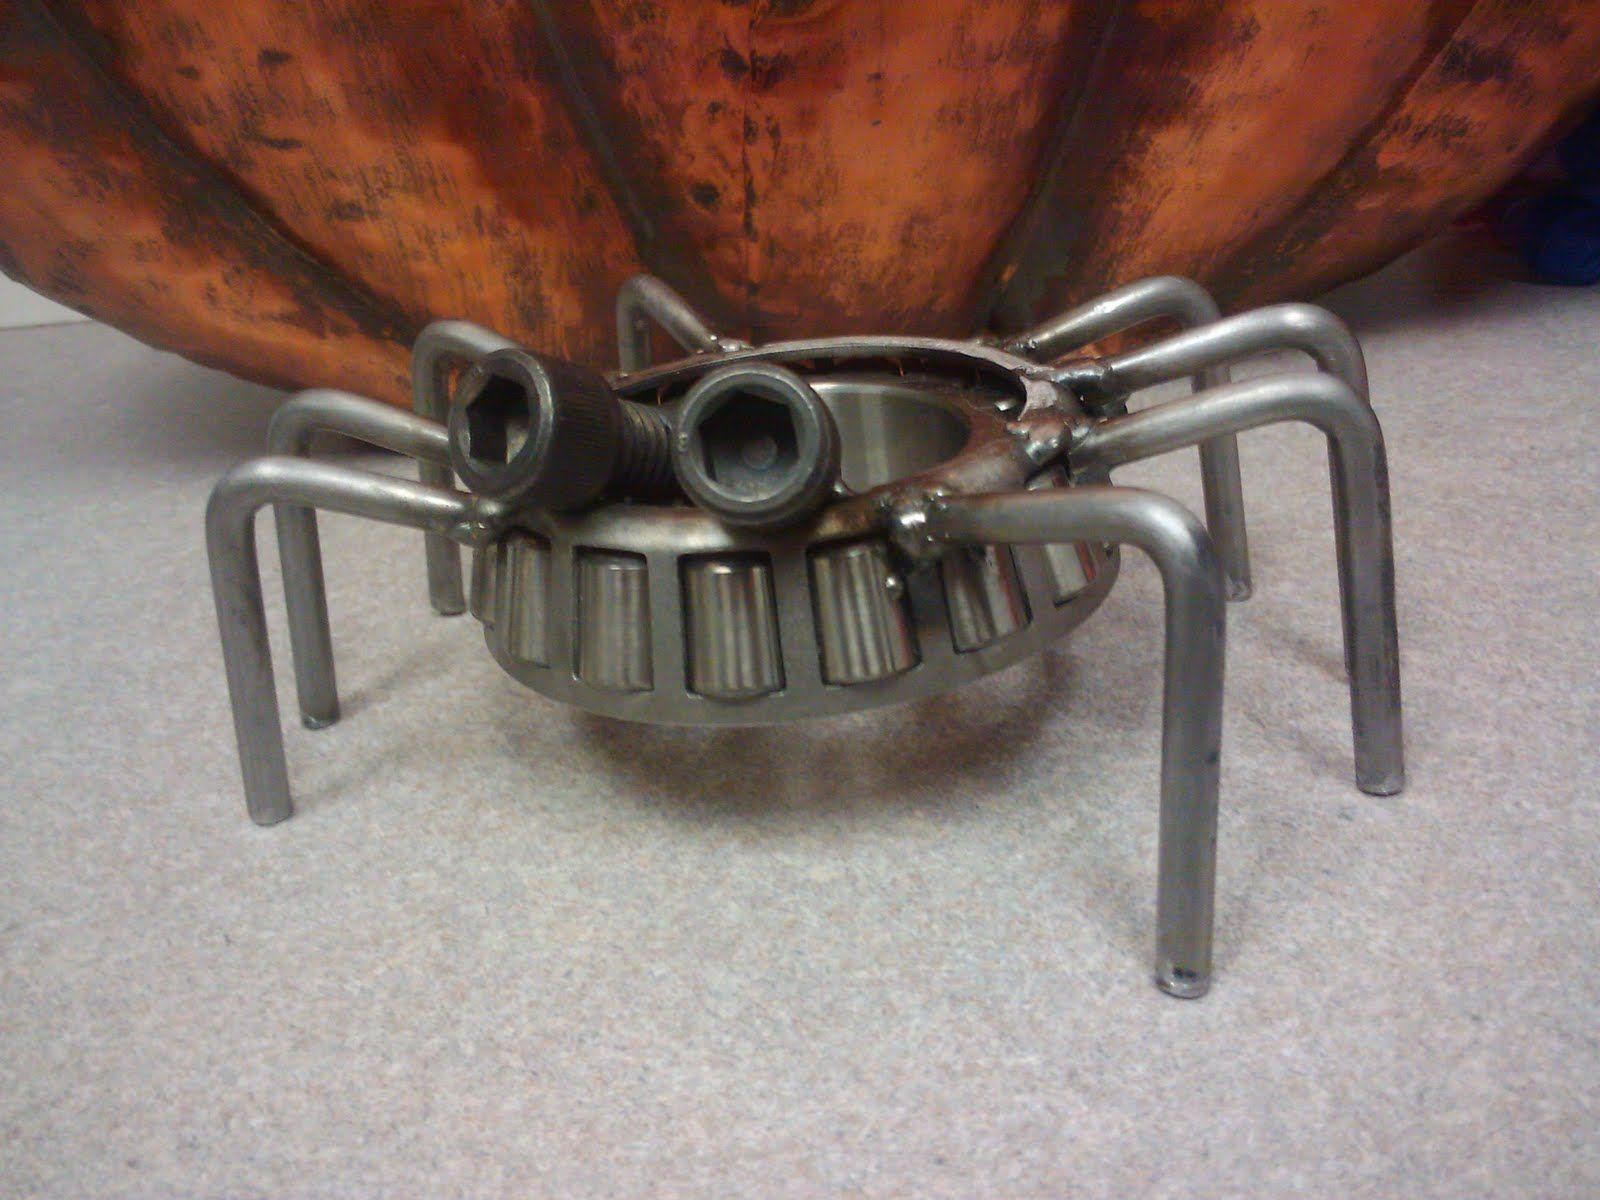 What Is Metal Art Gallery圖片網 I2yes愛凸悅斯 Scrap Metal Art Metal Art Metal Sculpture